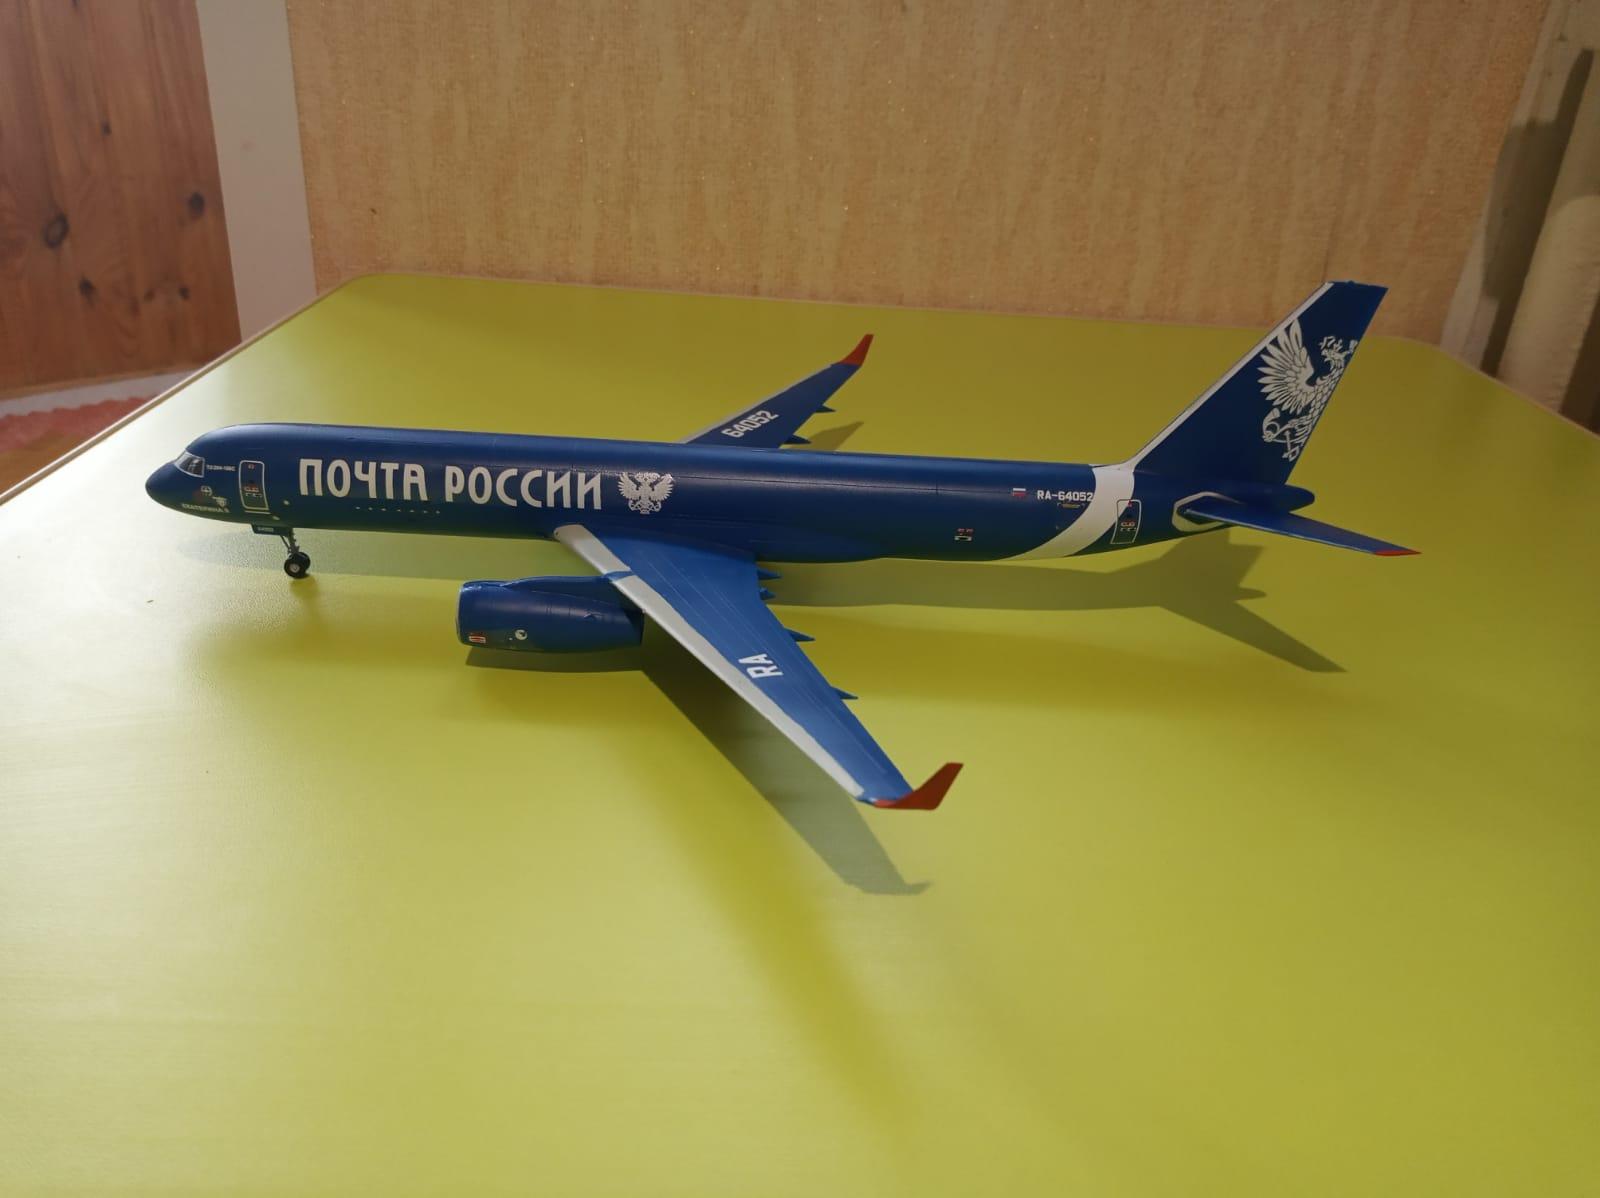 7022 Ту-204 Почта России Звезда, 1/144 Img-20210826-wa0001